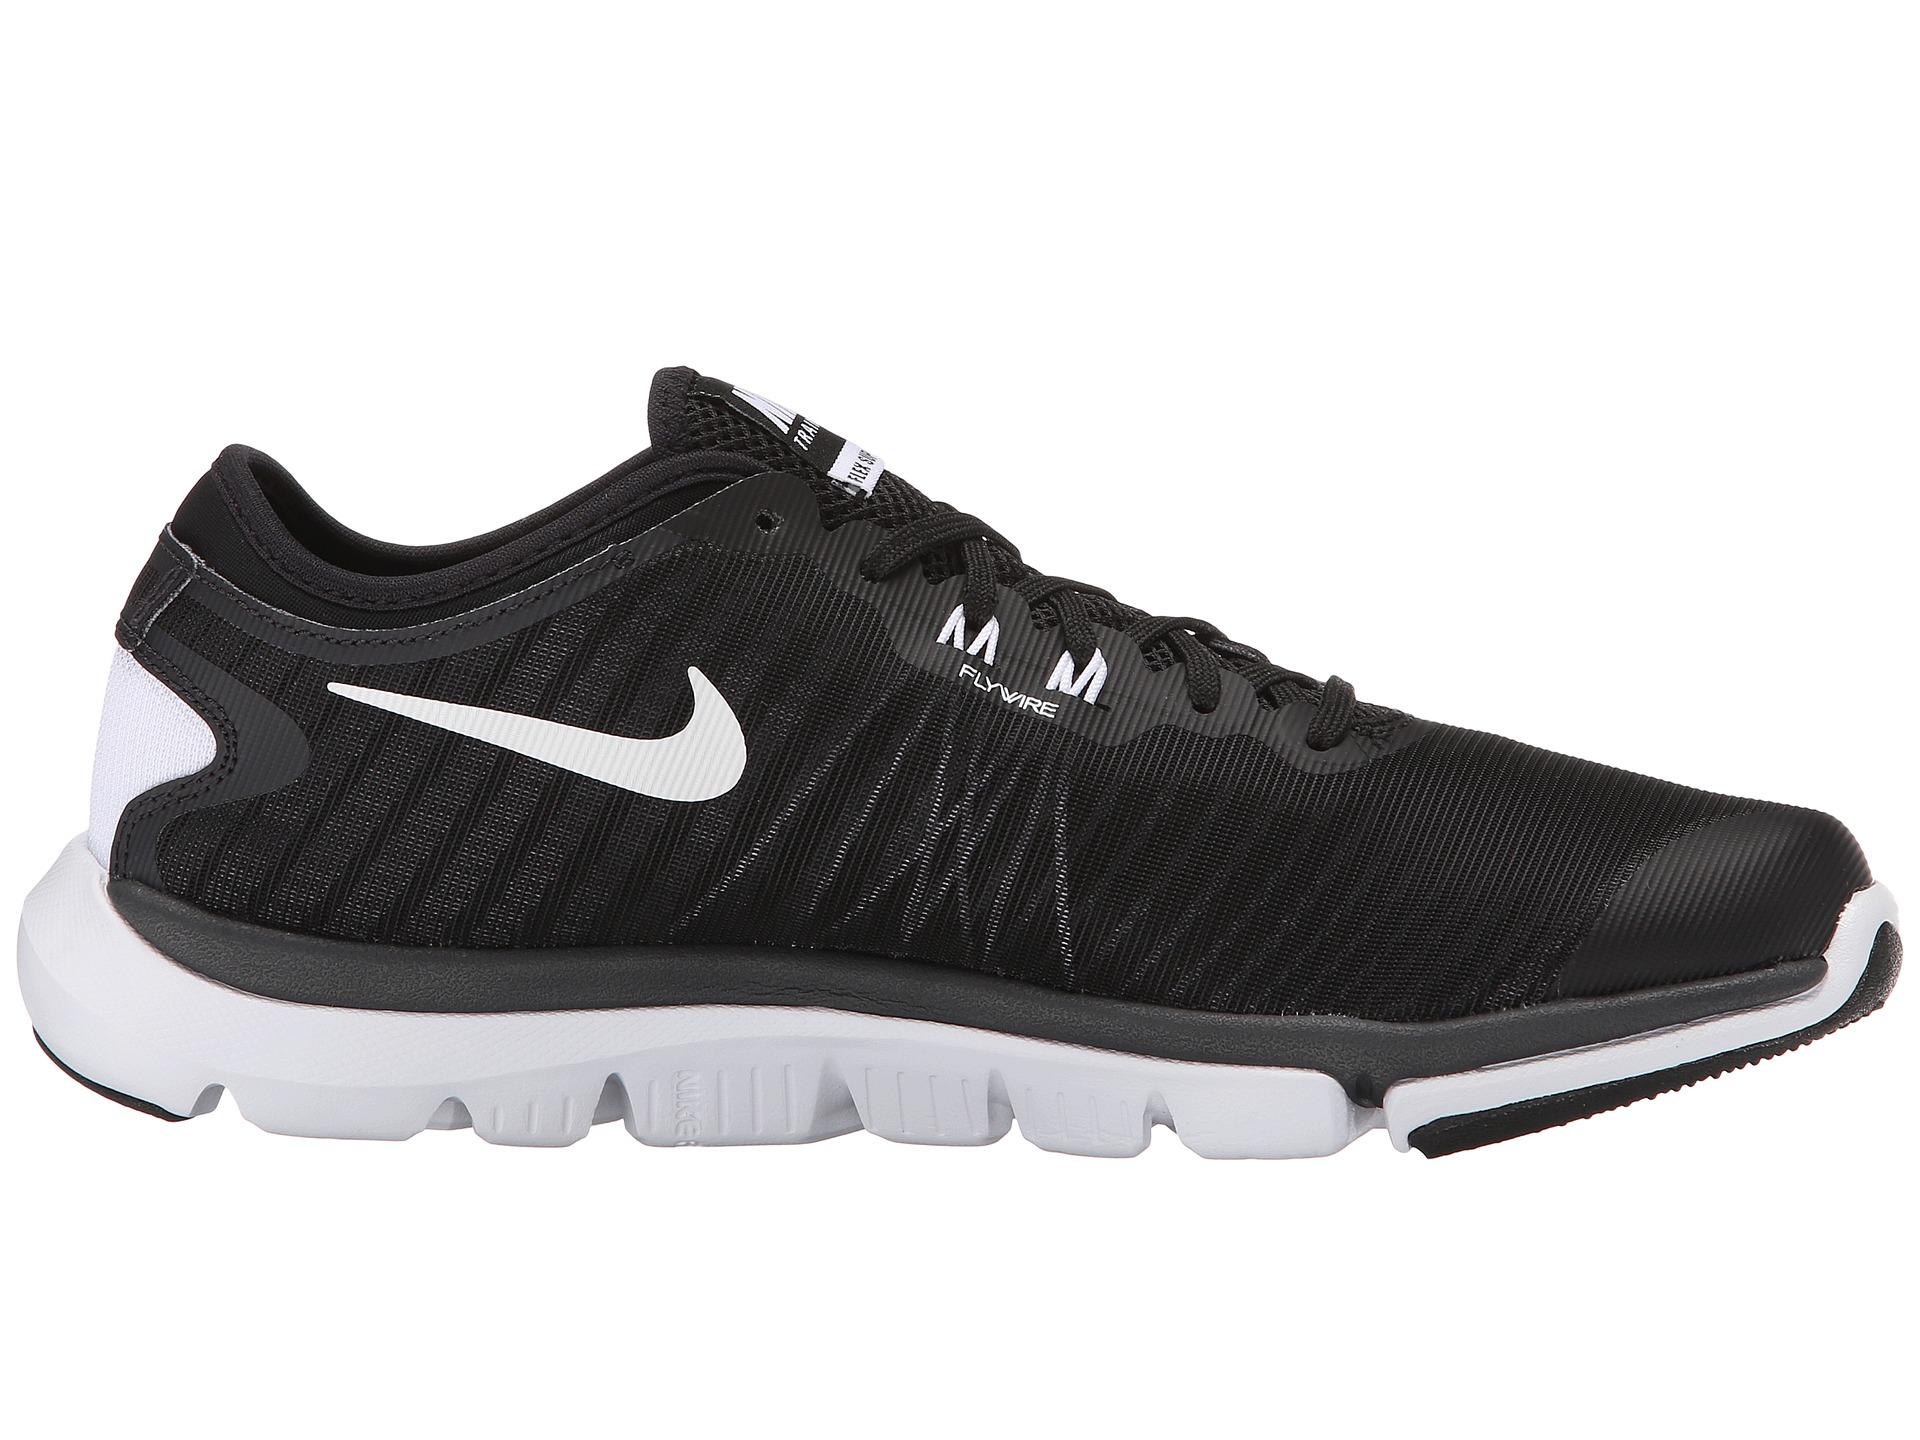 Nike Cross Training Shoes Filles